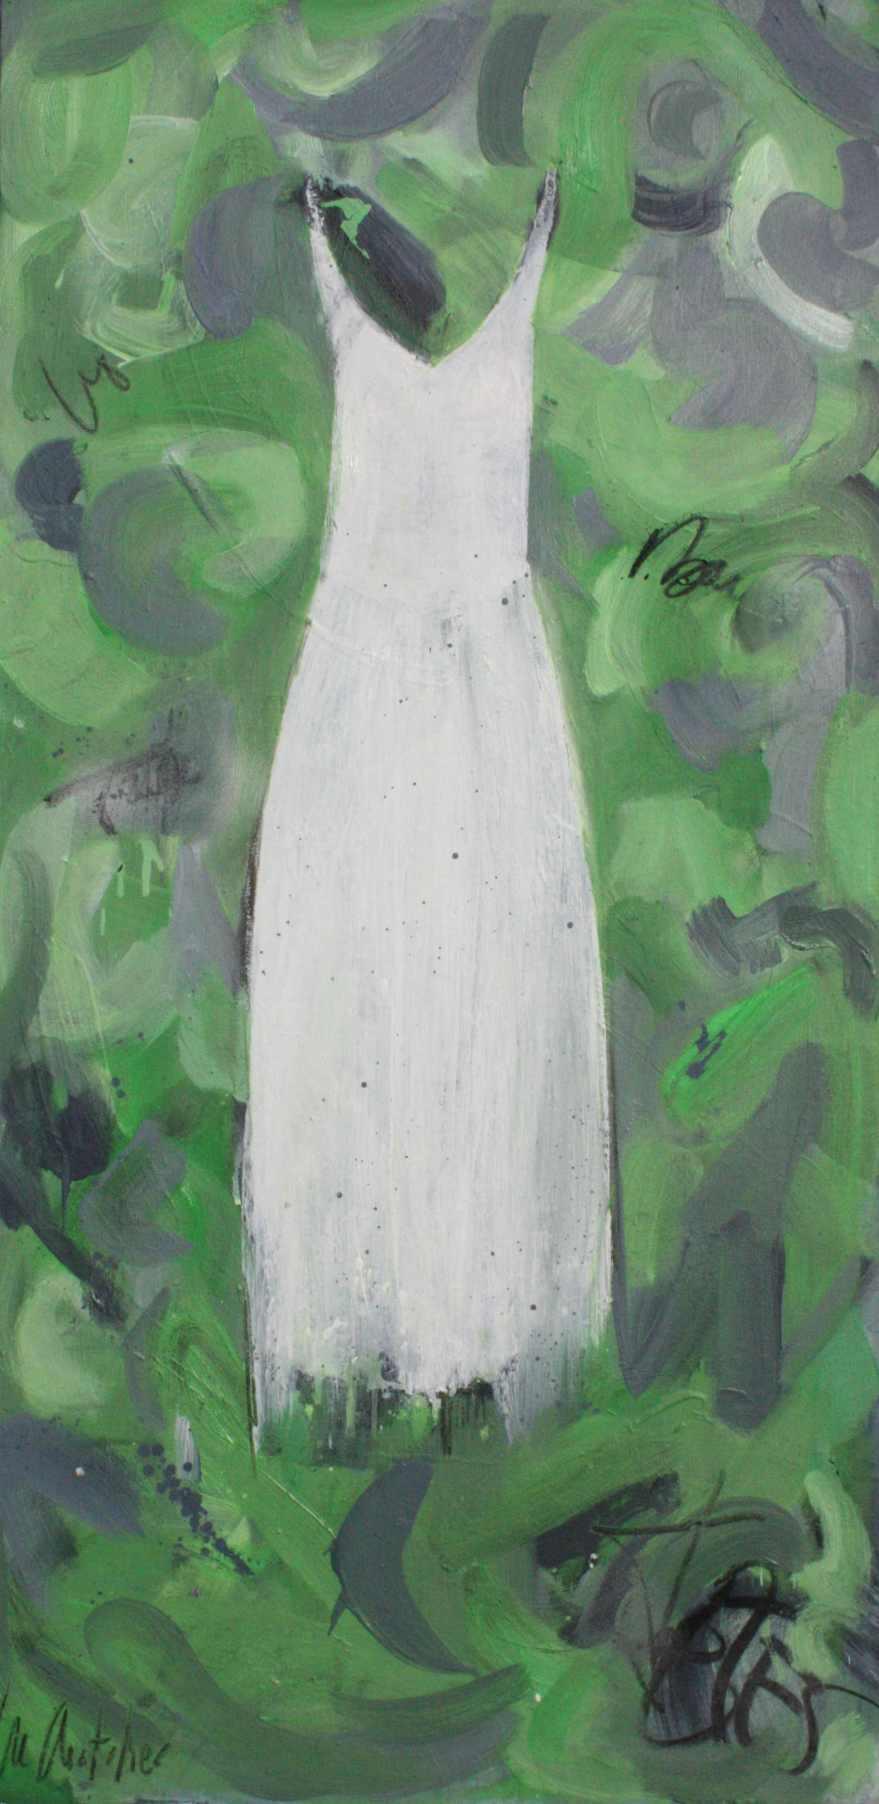 petite-robe-de-fete-100x50